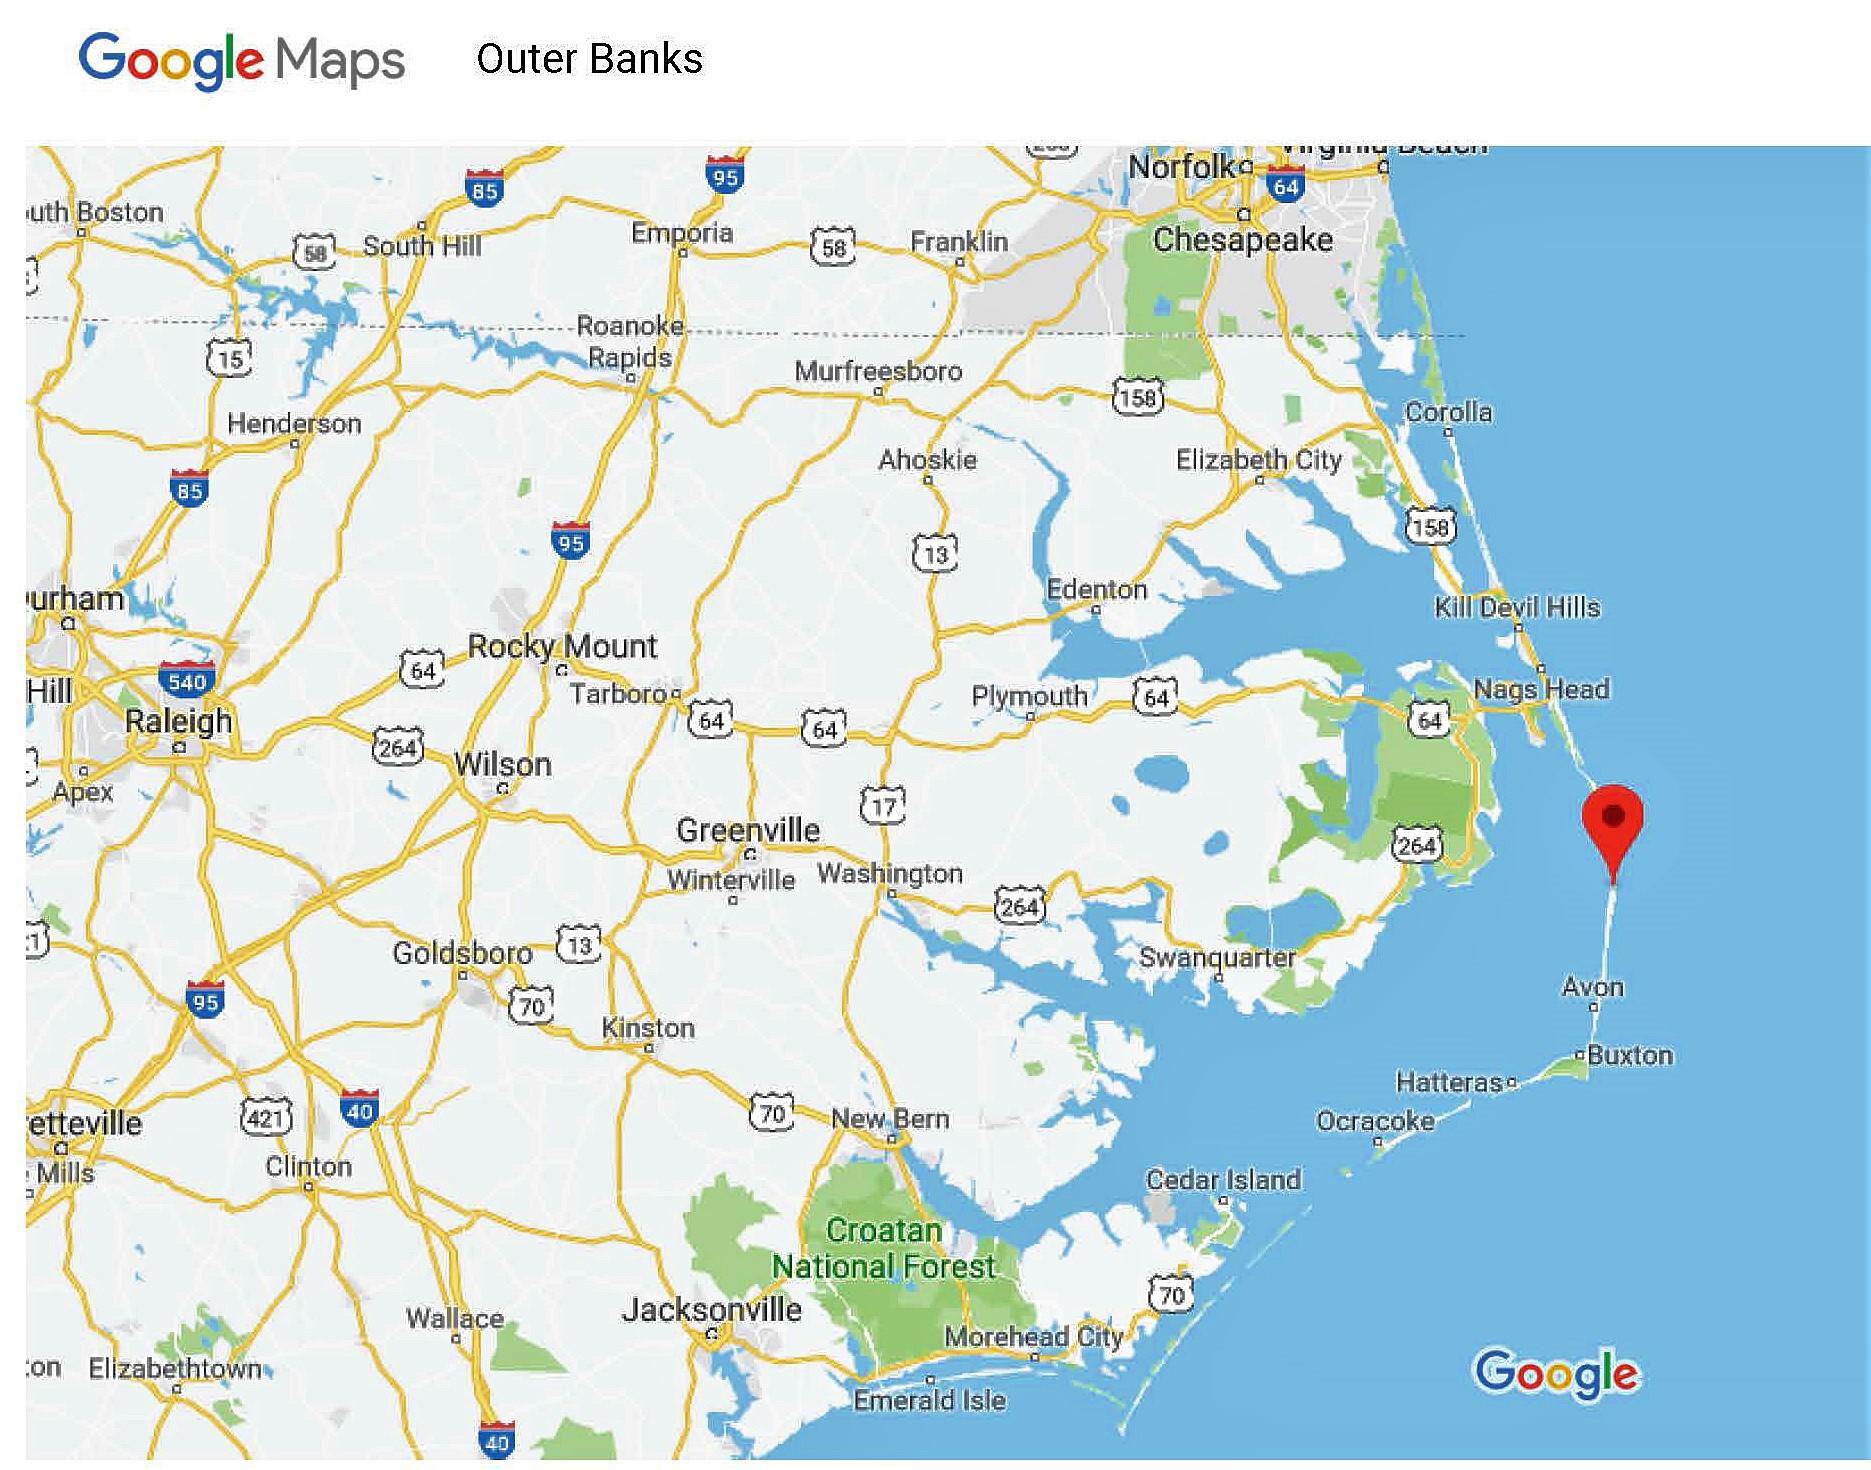 About Ocracoke Island, North Carolina - Ocracoke Observer on israel coast map, north oregon coast map, north washington coast map, sw florida coast map, oak island map, virginia coast map, south jersey coast map, portland coast map, fl coast map, carolina coastal map, gulf coast map, vermont coast map, western florida coast map, north california coast map, northeast coast map, emerald isle map, northern maine coast map, s california coast map, southwest florida coast map,